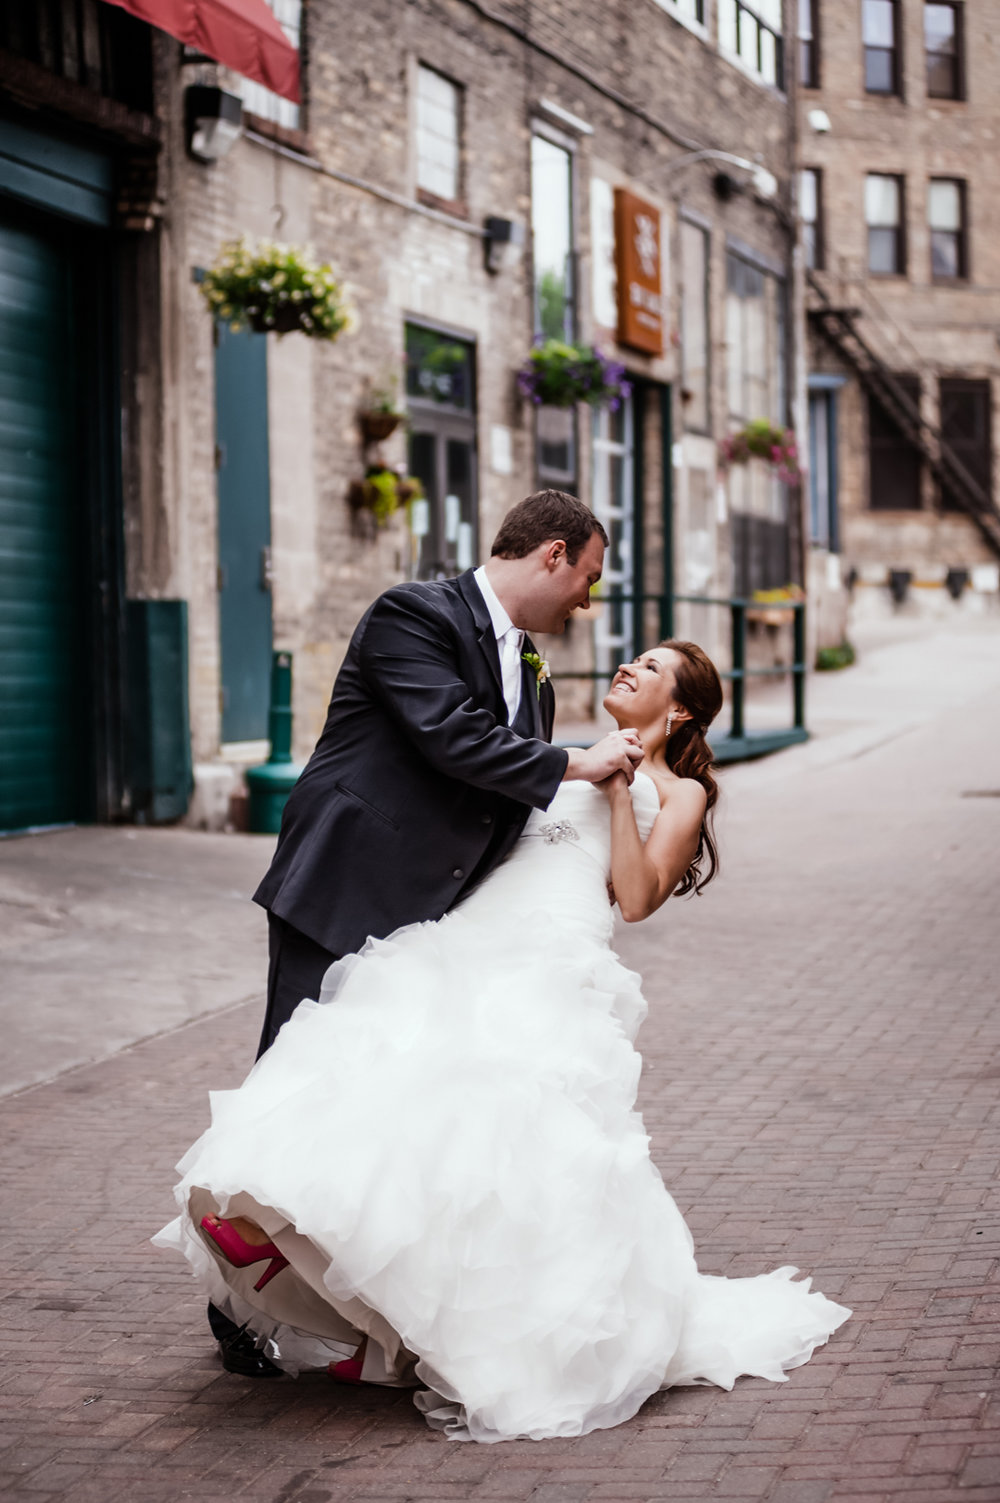 TerraSura-Weddings-Web-6047.jpg